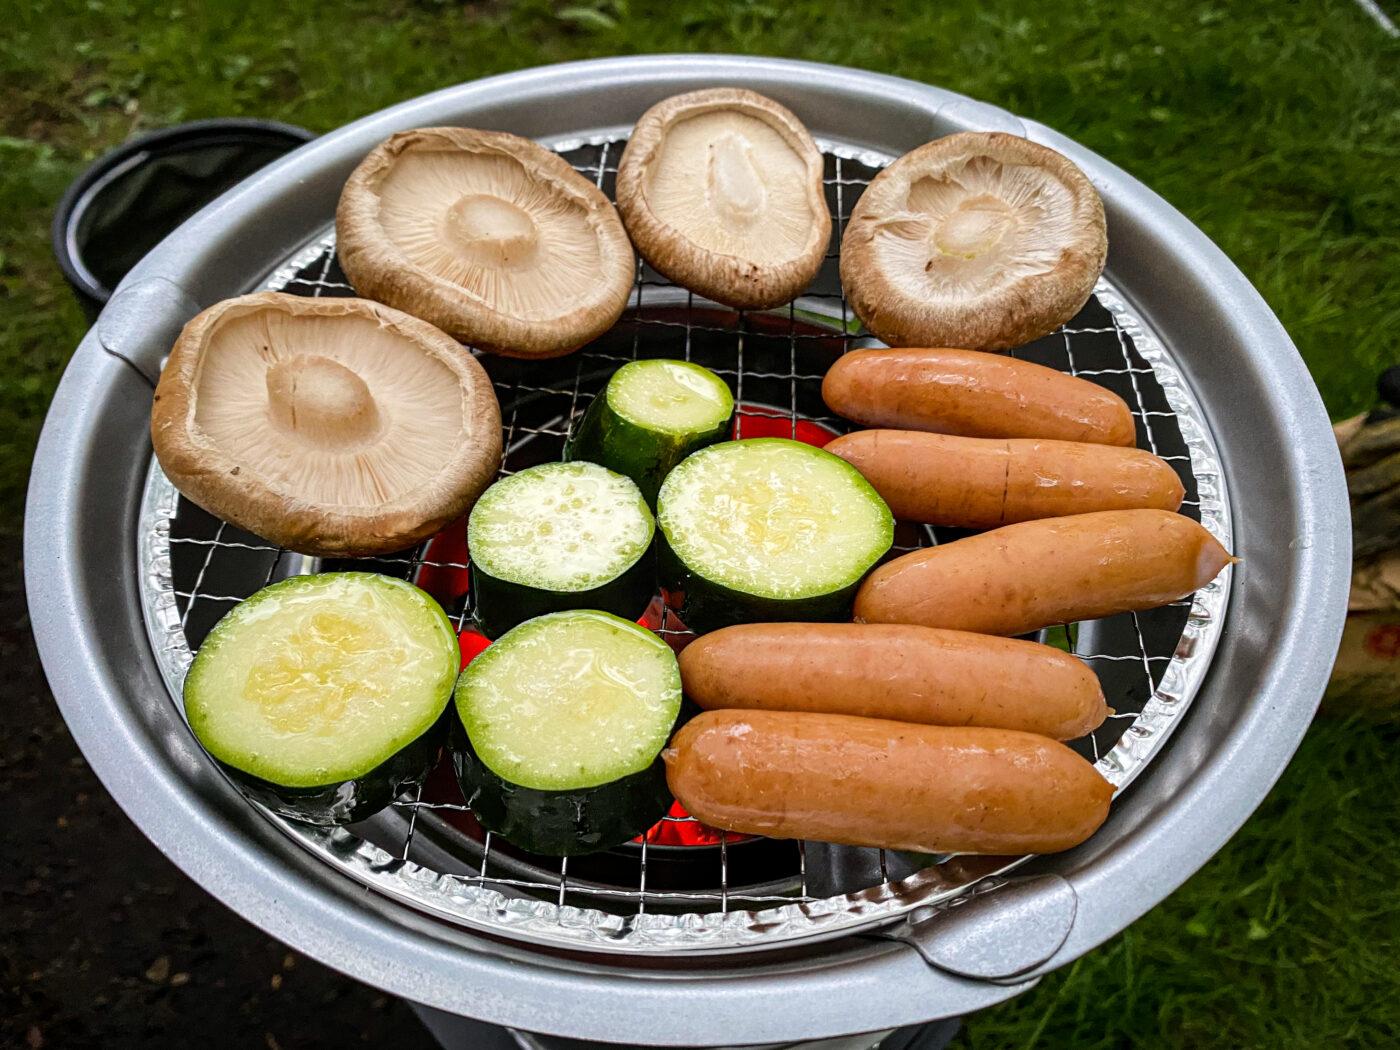 tab.マルチに使える缶ストーブは複数でのキャンプ、BBQでも活躍できるポテンシャルを秘めたグリル兼焚火台